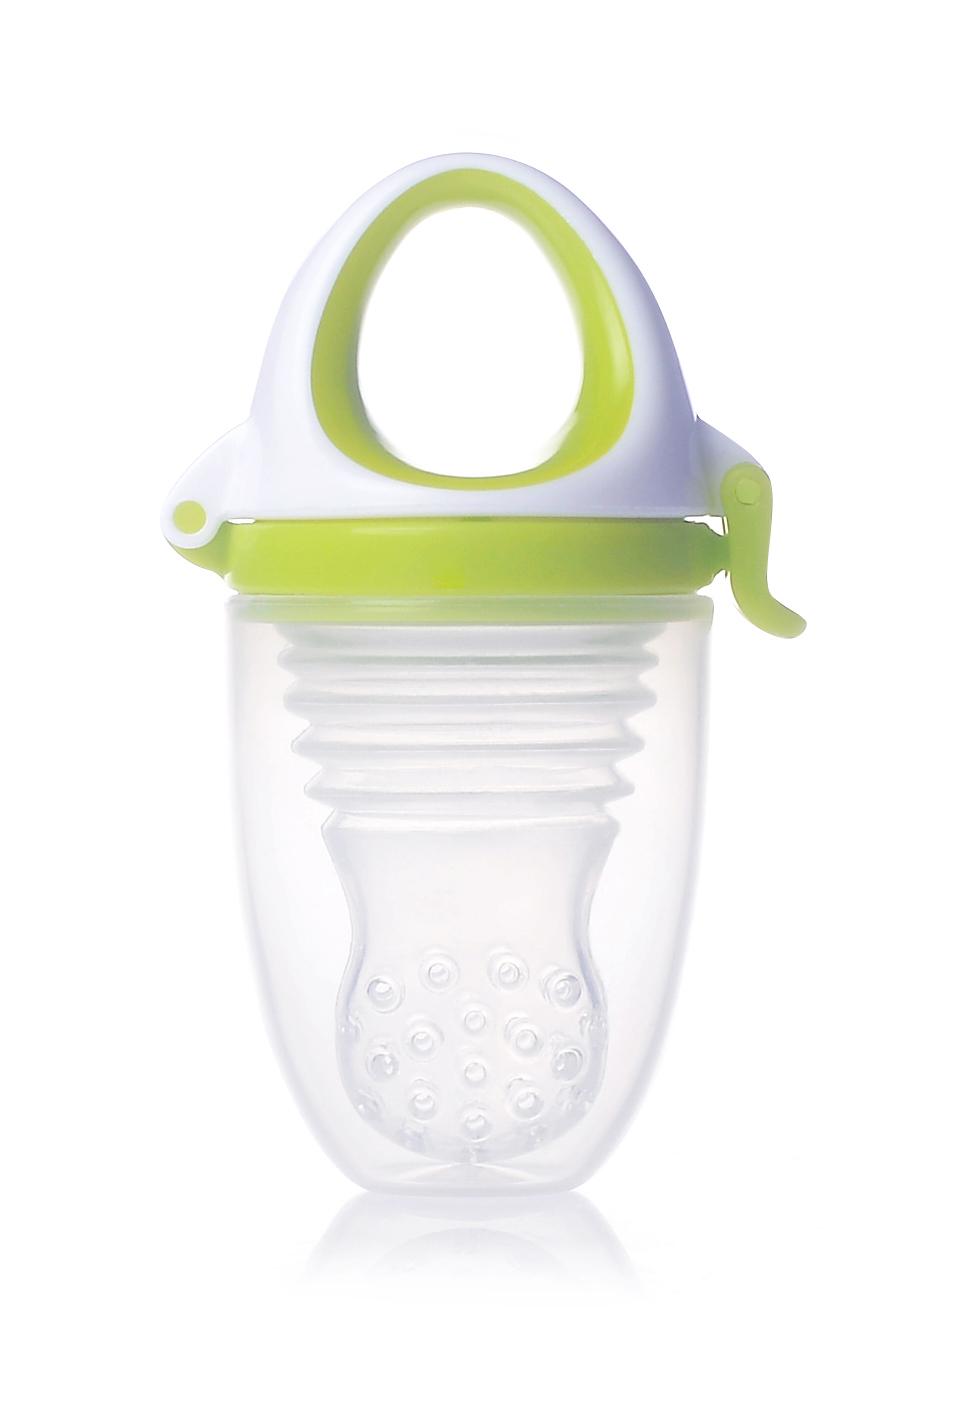 Akcija! Kidsme Food Feeder Plus bērna ēdināšanas ierīce no 6 mēn, Lime 160361LI 6474 aksesuāri bērniem